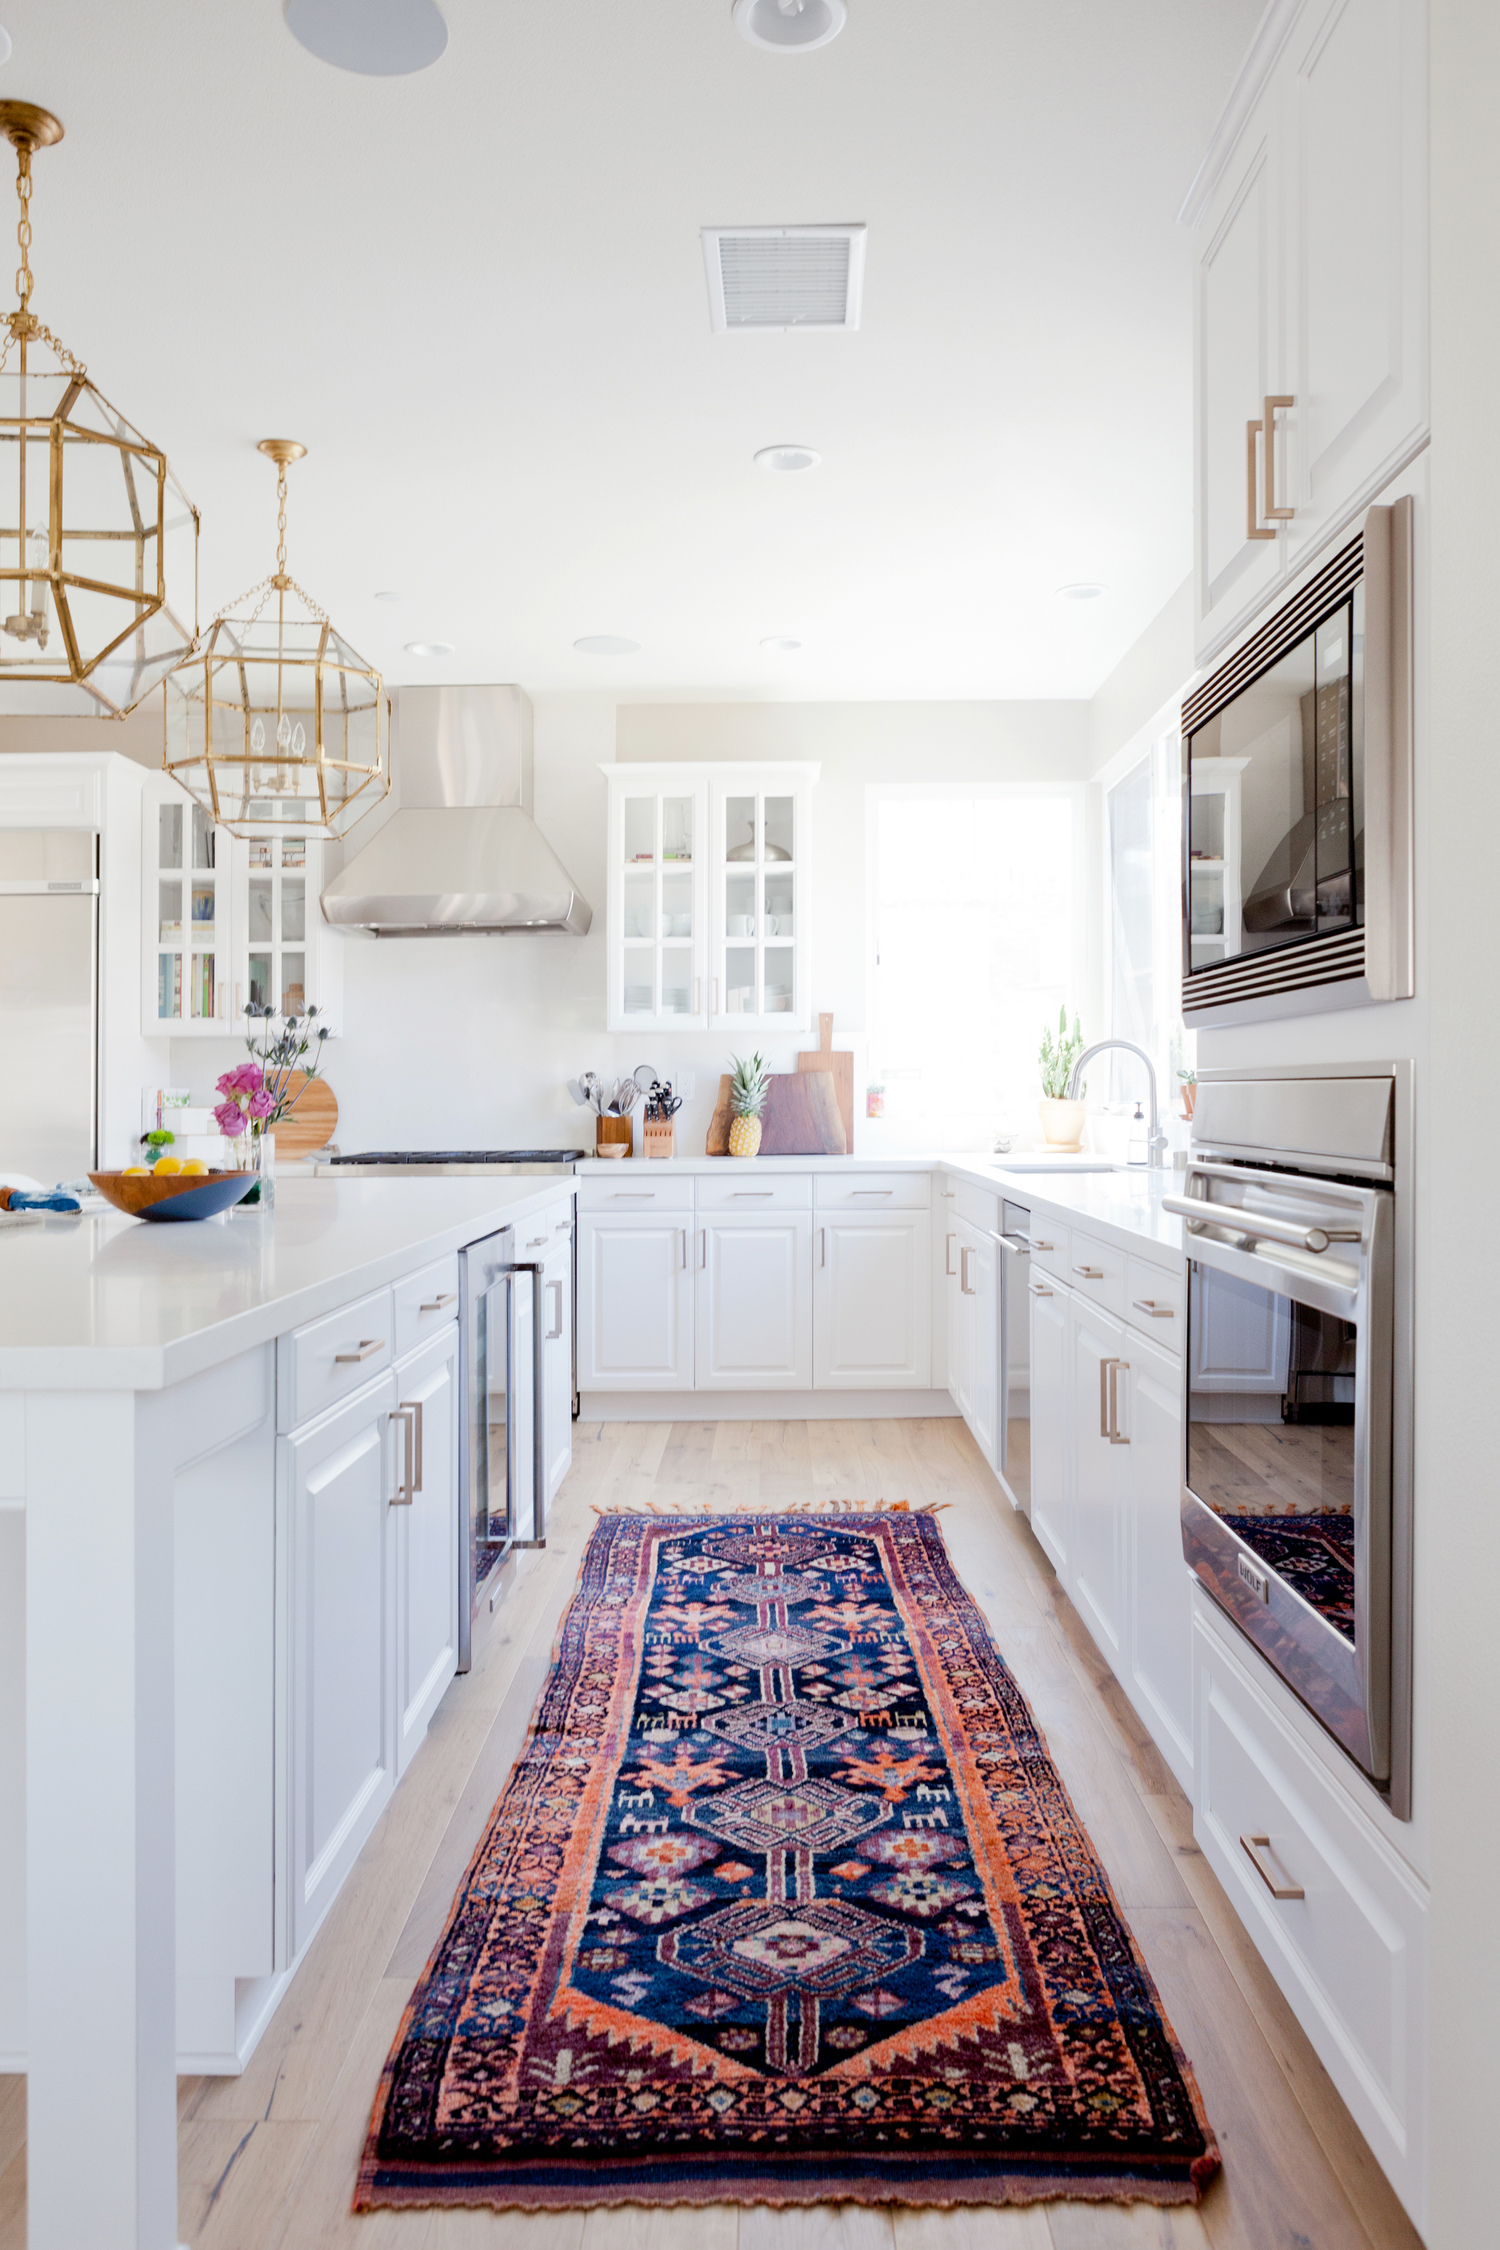 Modern White Bright Kitchen Vintage Persian Runner Rug Vibrant Color Jewel Tone